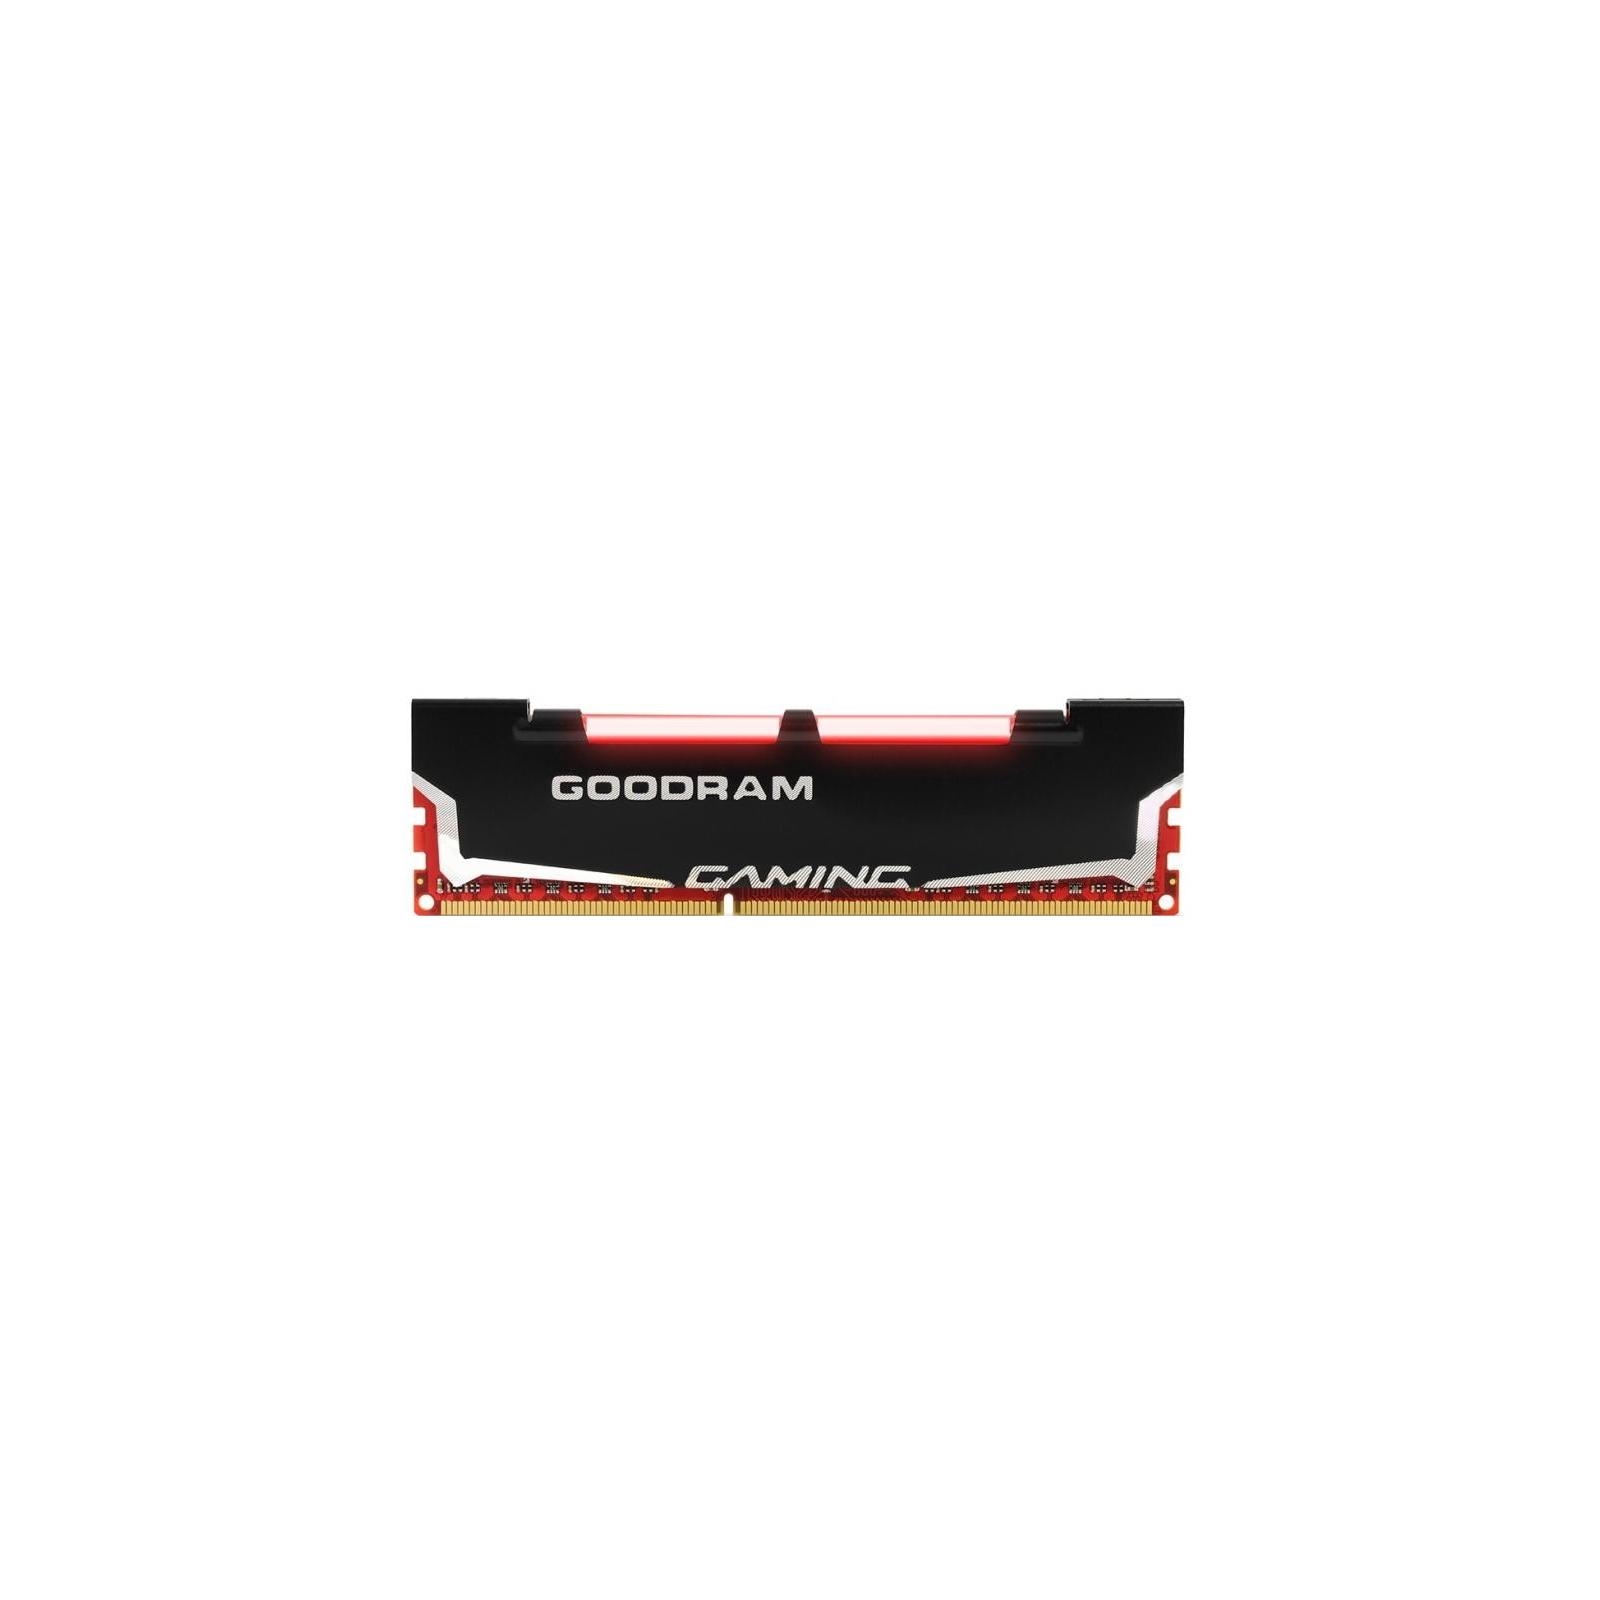 Модуль памяти для компьютера DDR3 4GB 1600 MHz Led Gaming GOODRAM (GL1600D364L9S/4G)